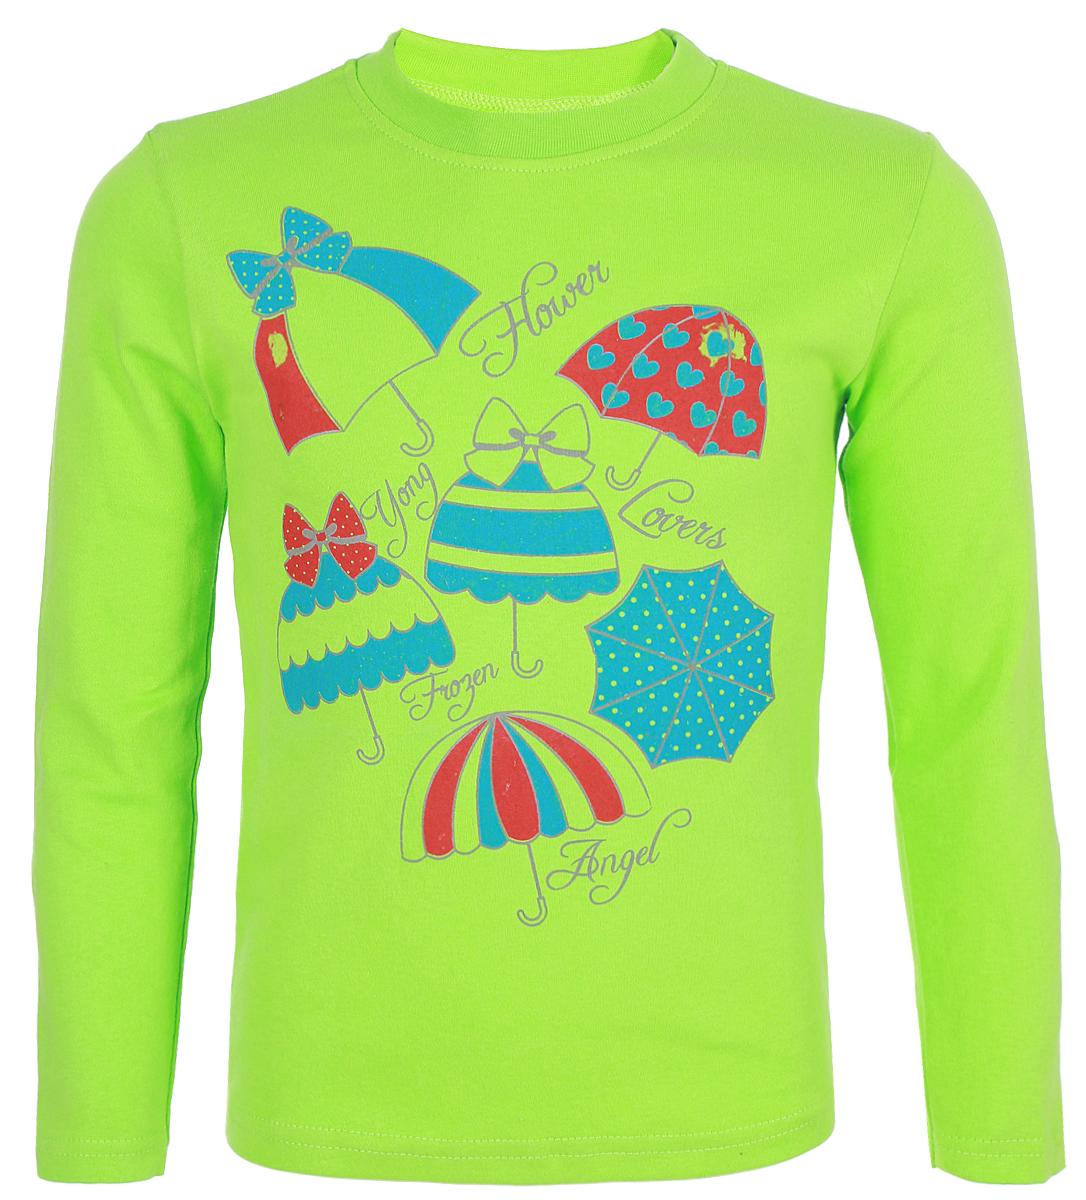 Джемпер для девочки Arge Fashion, цвет: светло-зеленый. MRM-15B-42-10. Размер 122MRM-15B-42-10